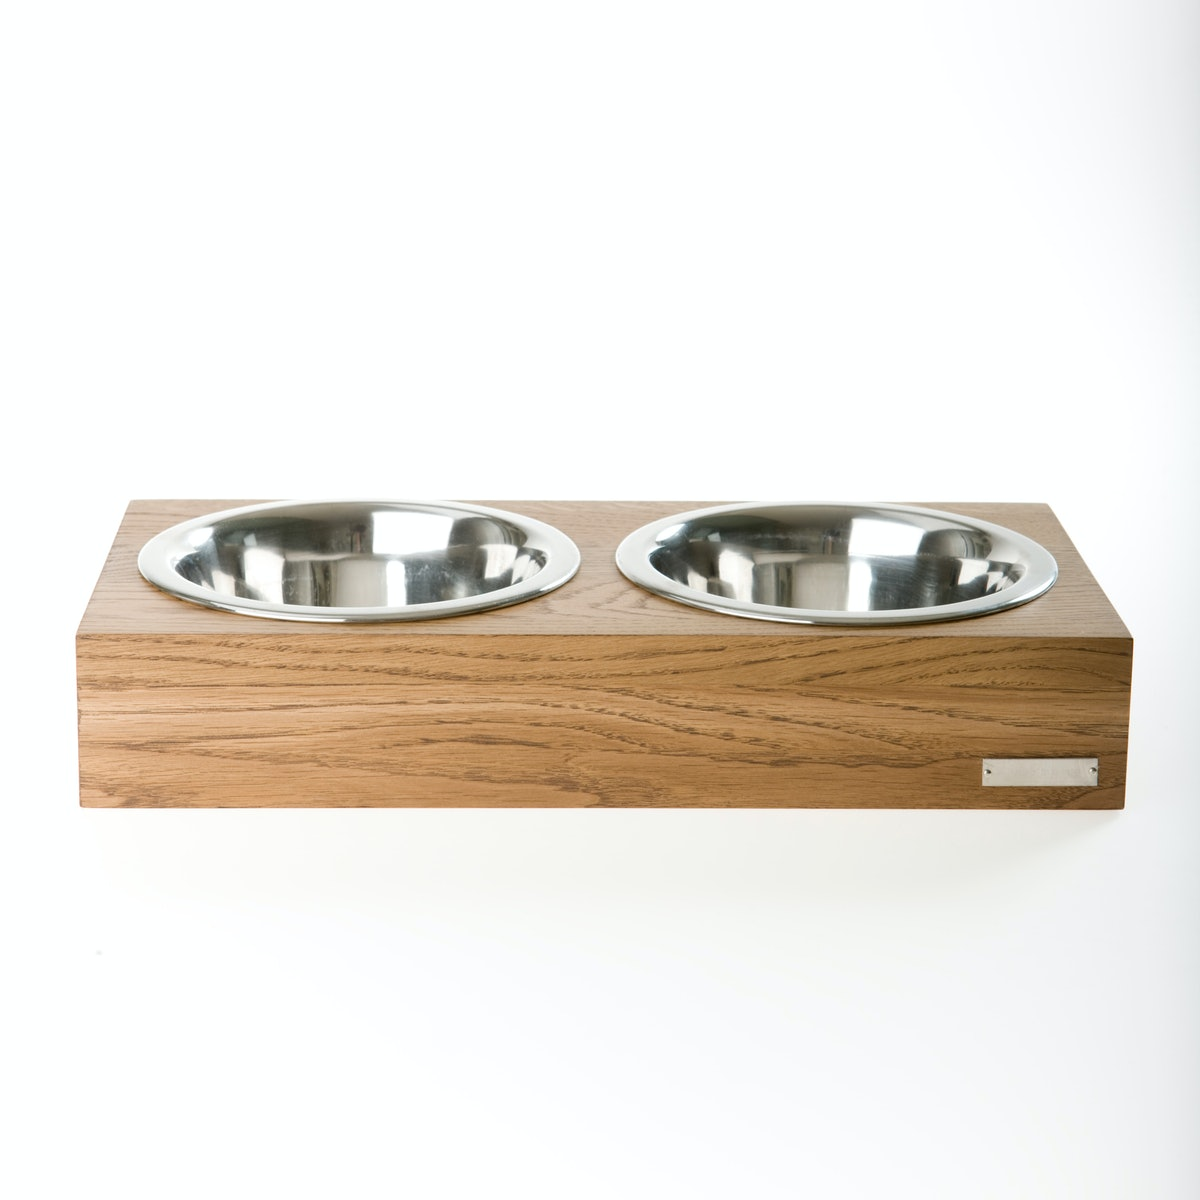 Mungo & Maud, Dog & Cat Outfitters dog-bowl set, $244, Barneys New York.